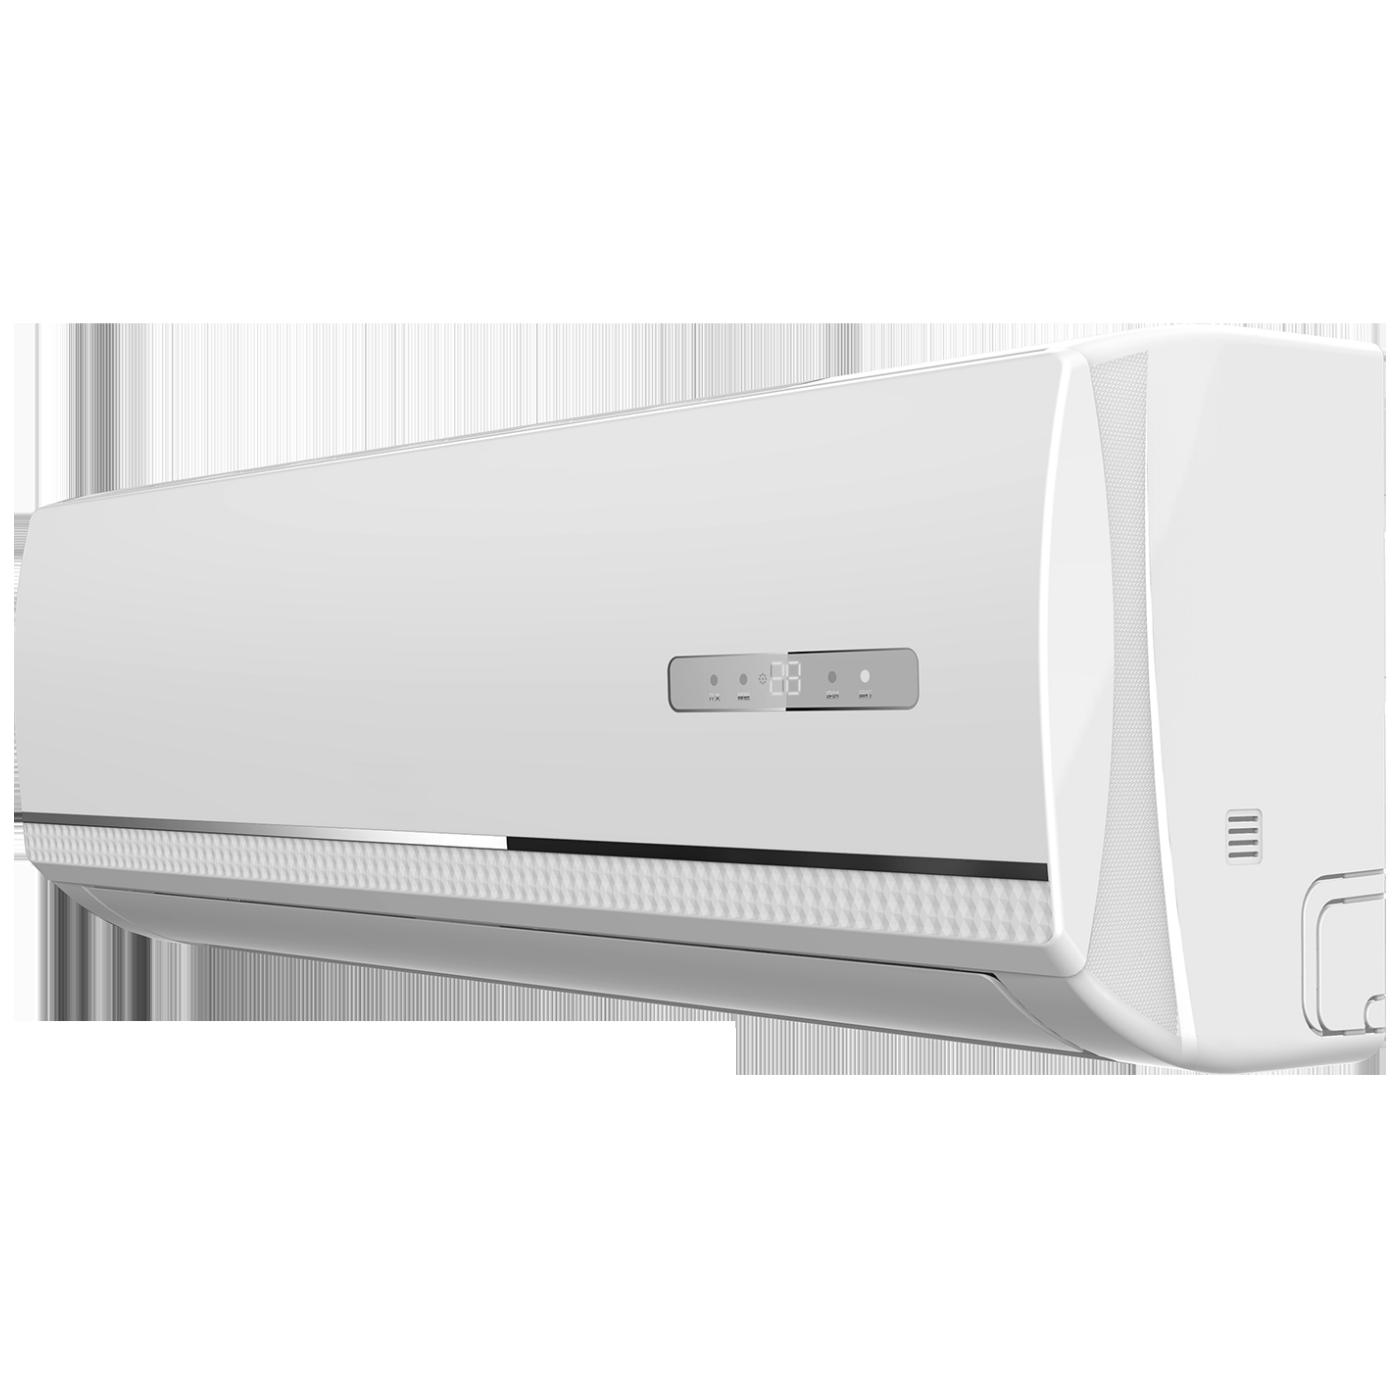 KFR-25GW Inverter